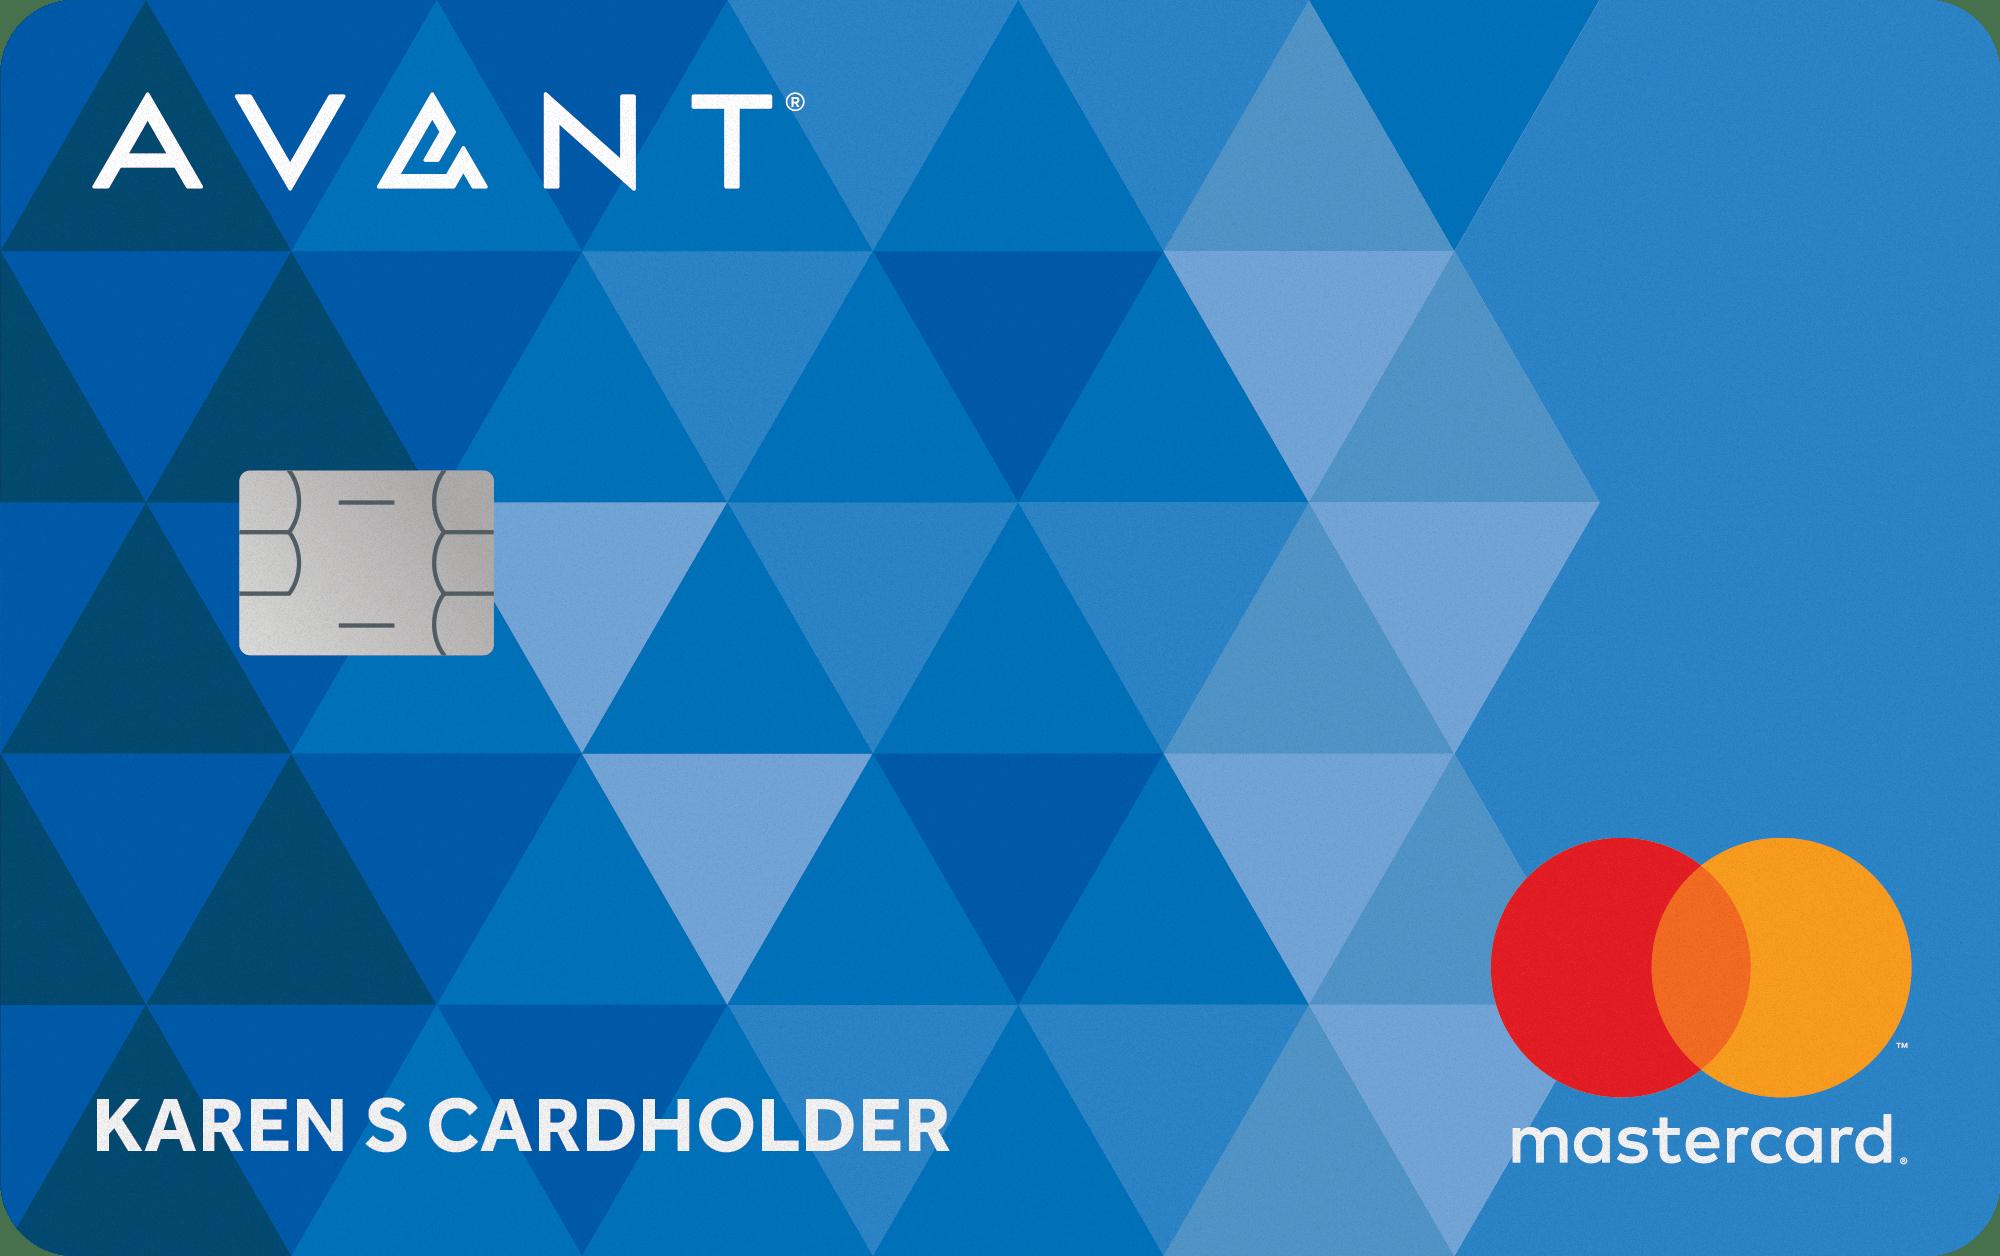 AvantCard